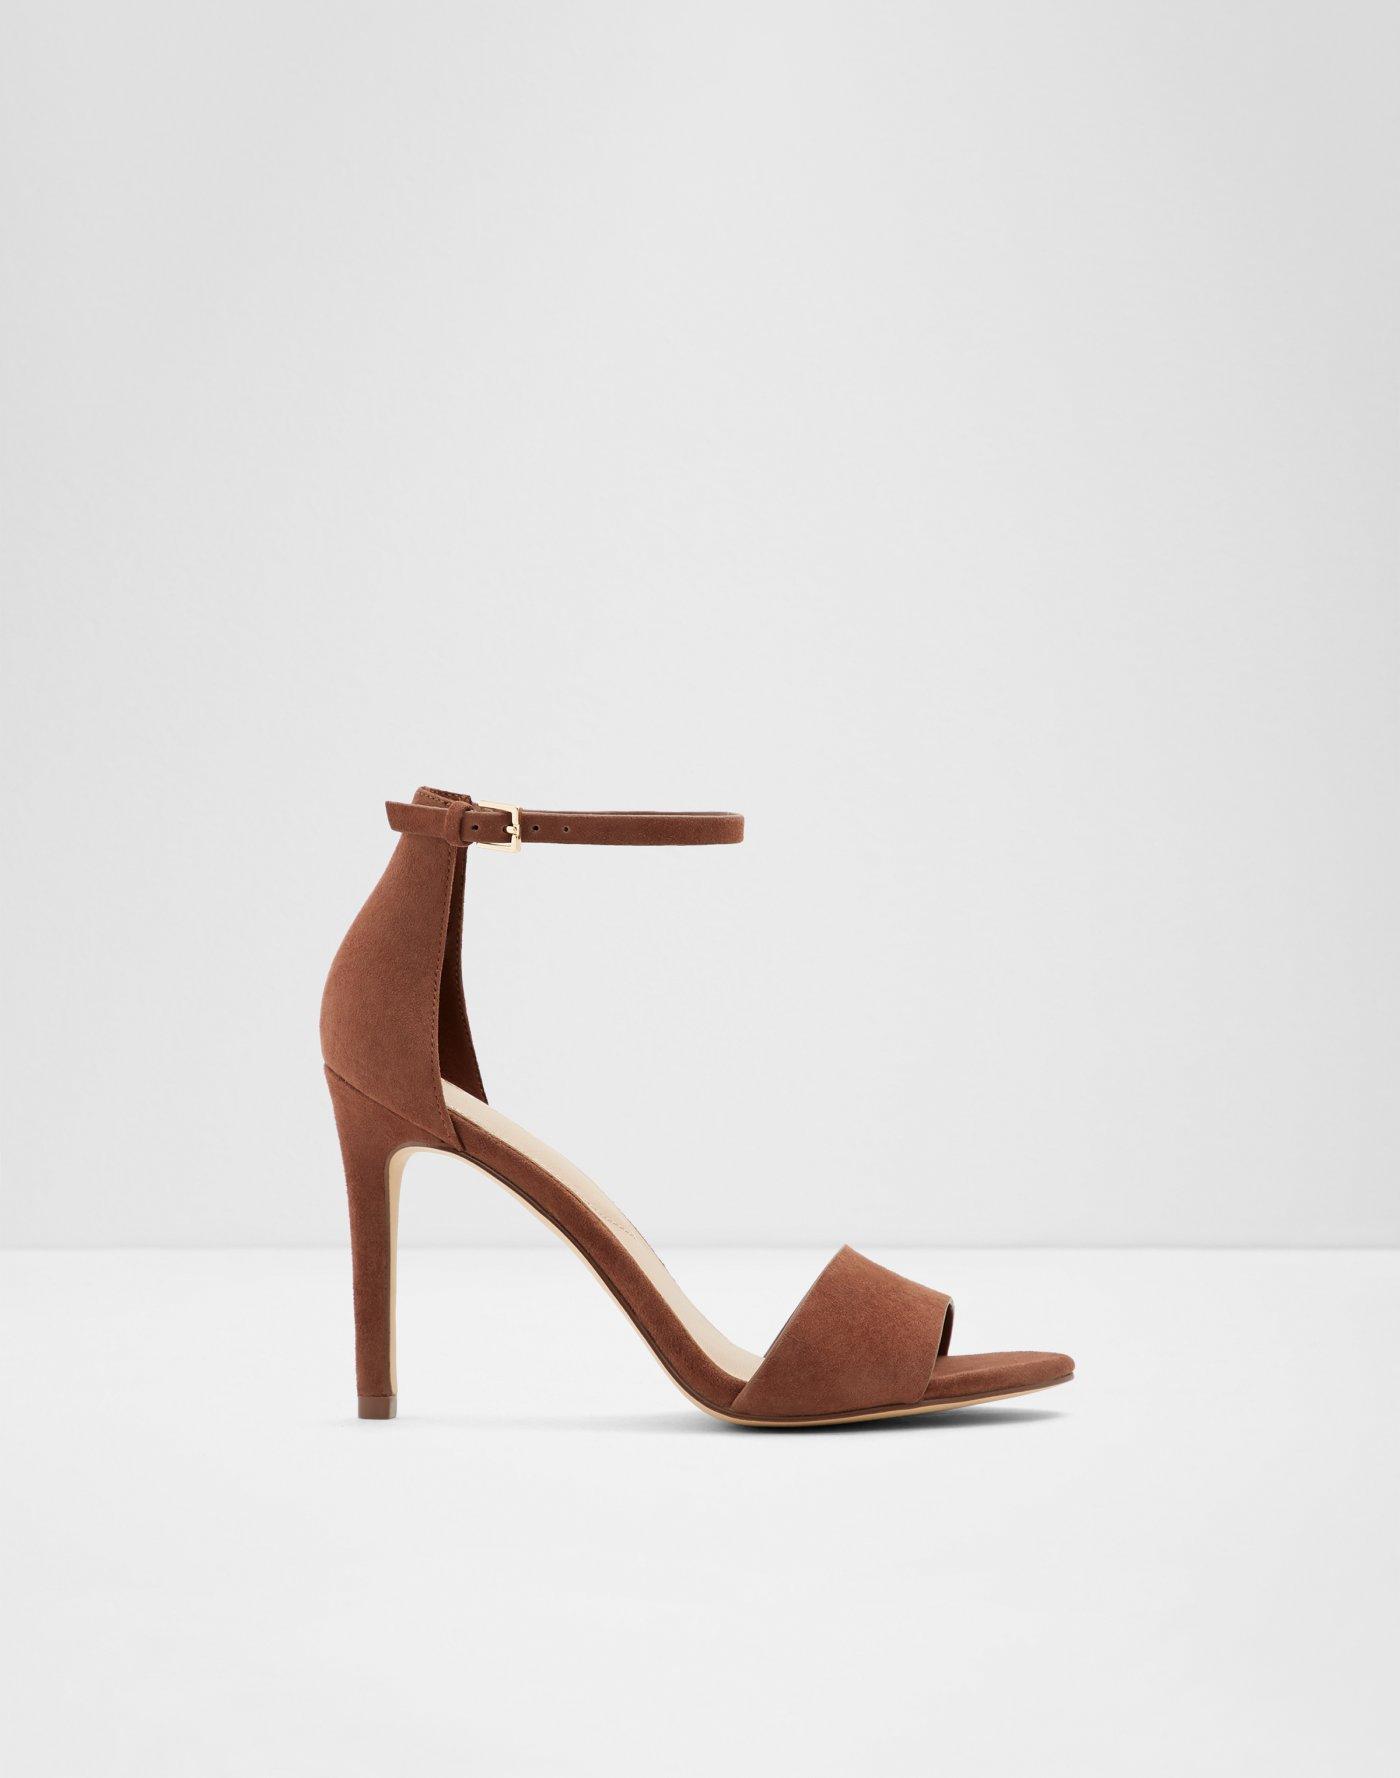 9a3a2939cb6 Women's Sales | Shoe Sale | ALDO Canada | ALDO Canada